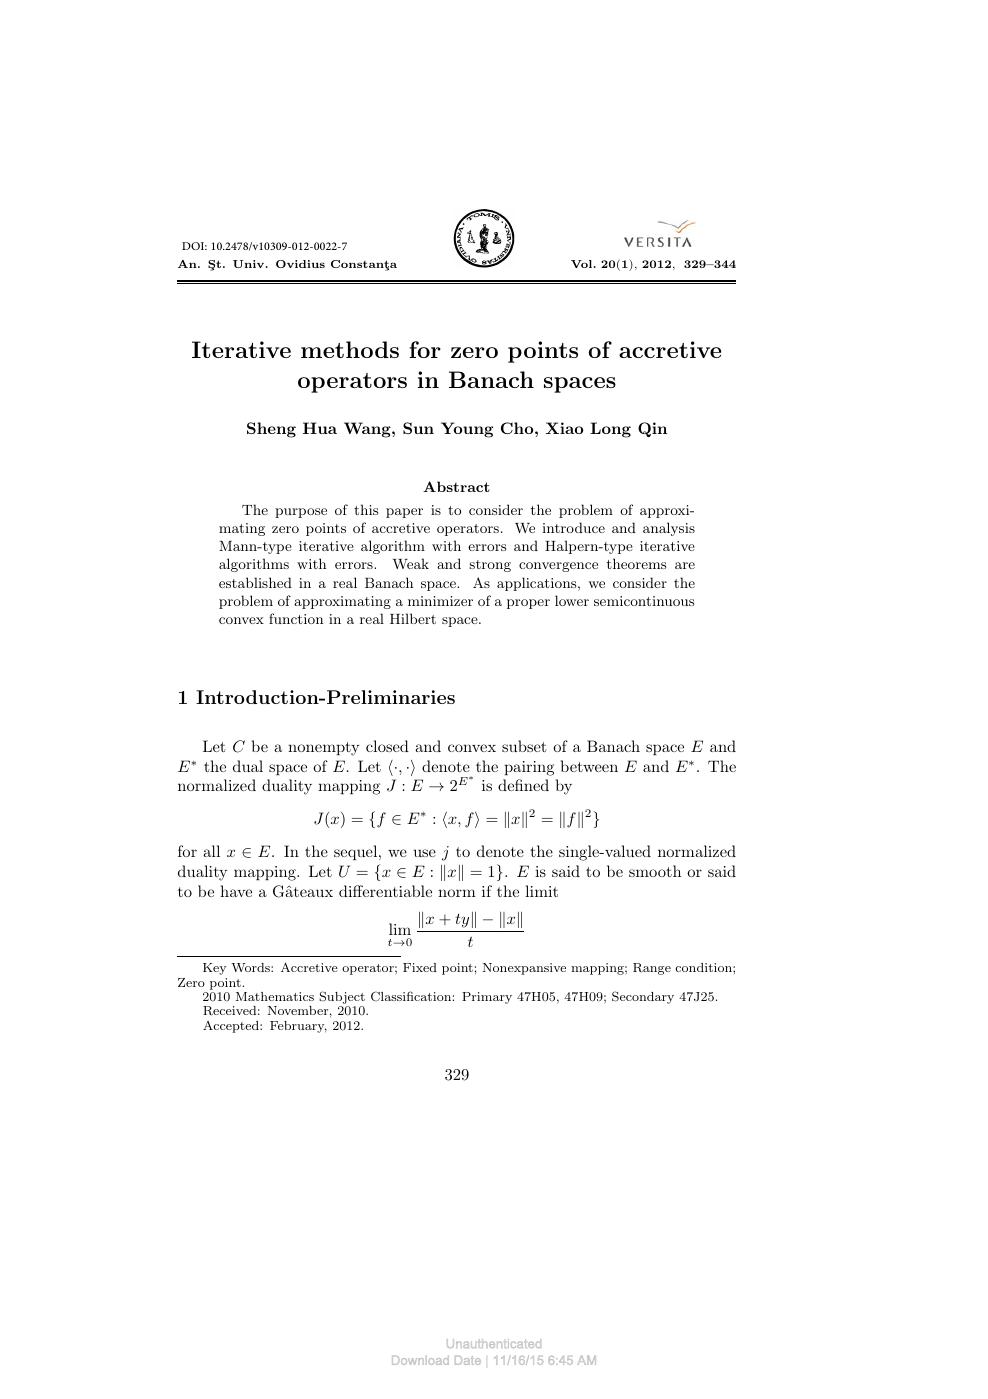 Iterative methods for zero points of accretive operators in